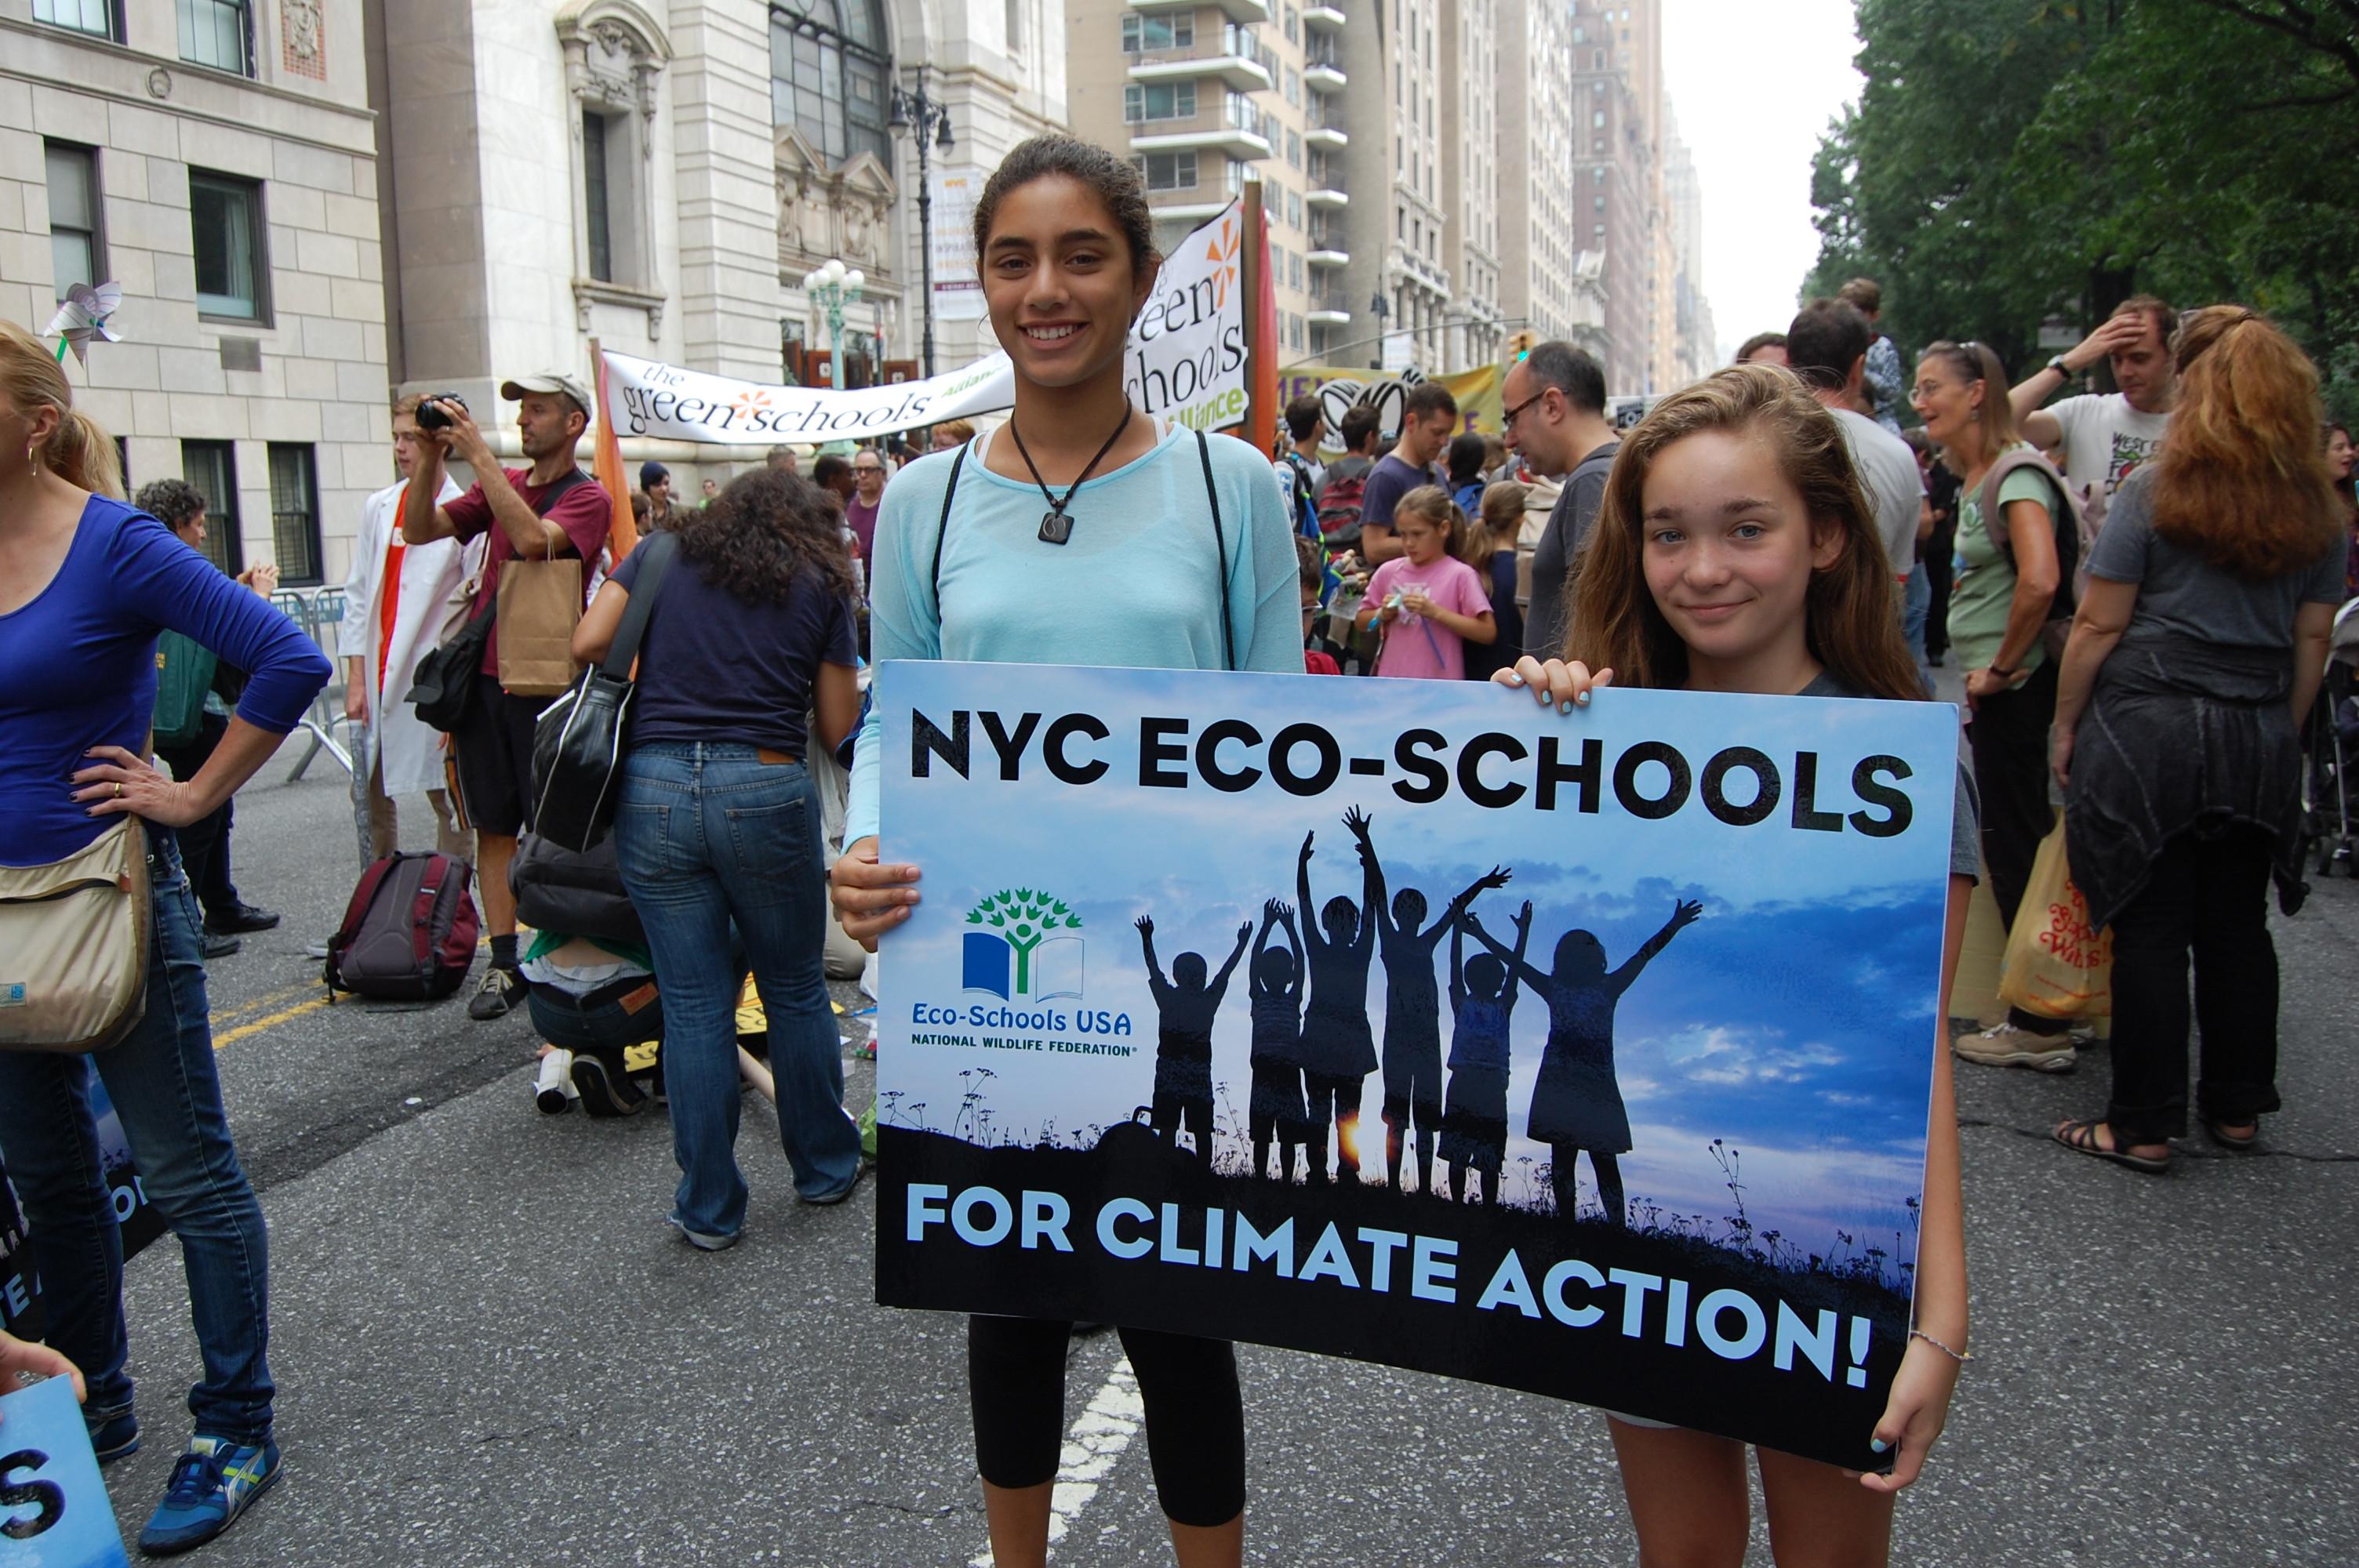 Eco-Schools USA marchers